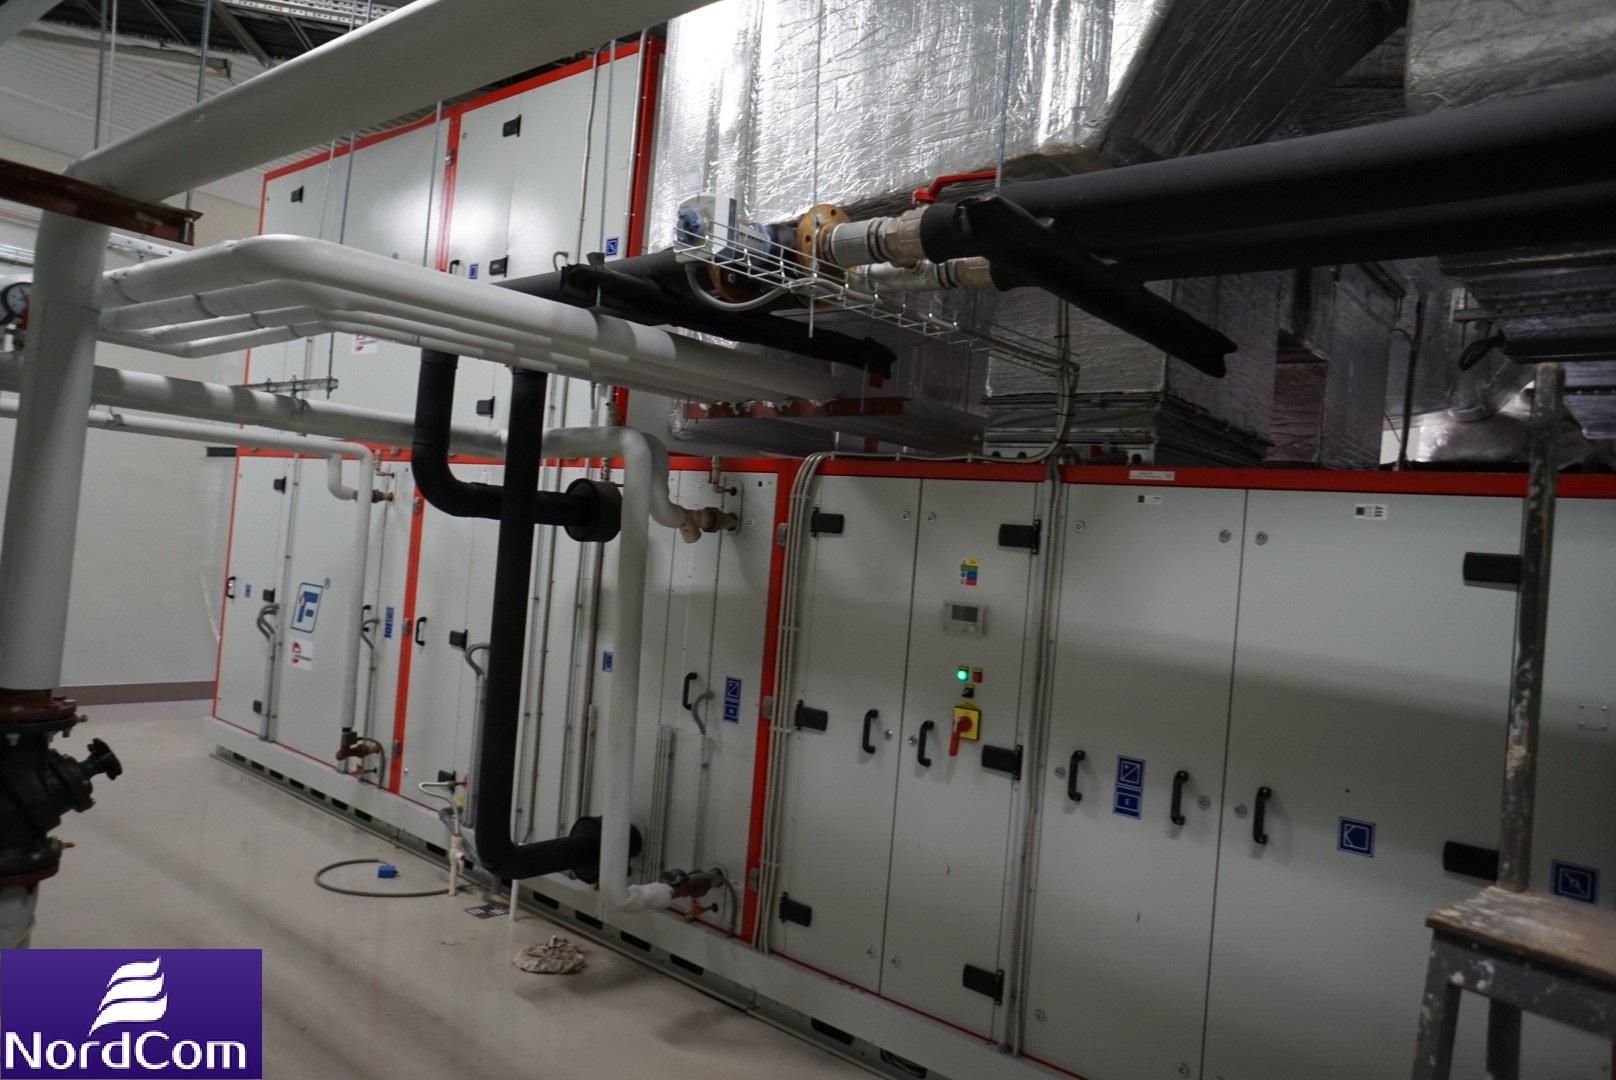 nordcom-spb-test-1